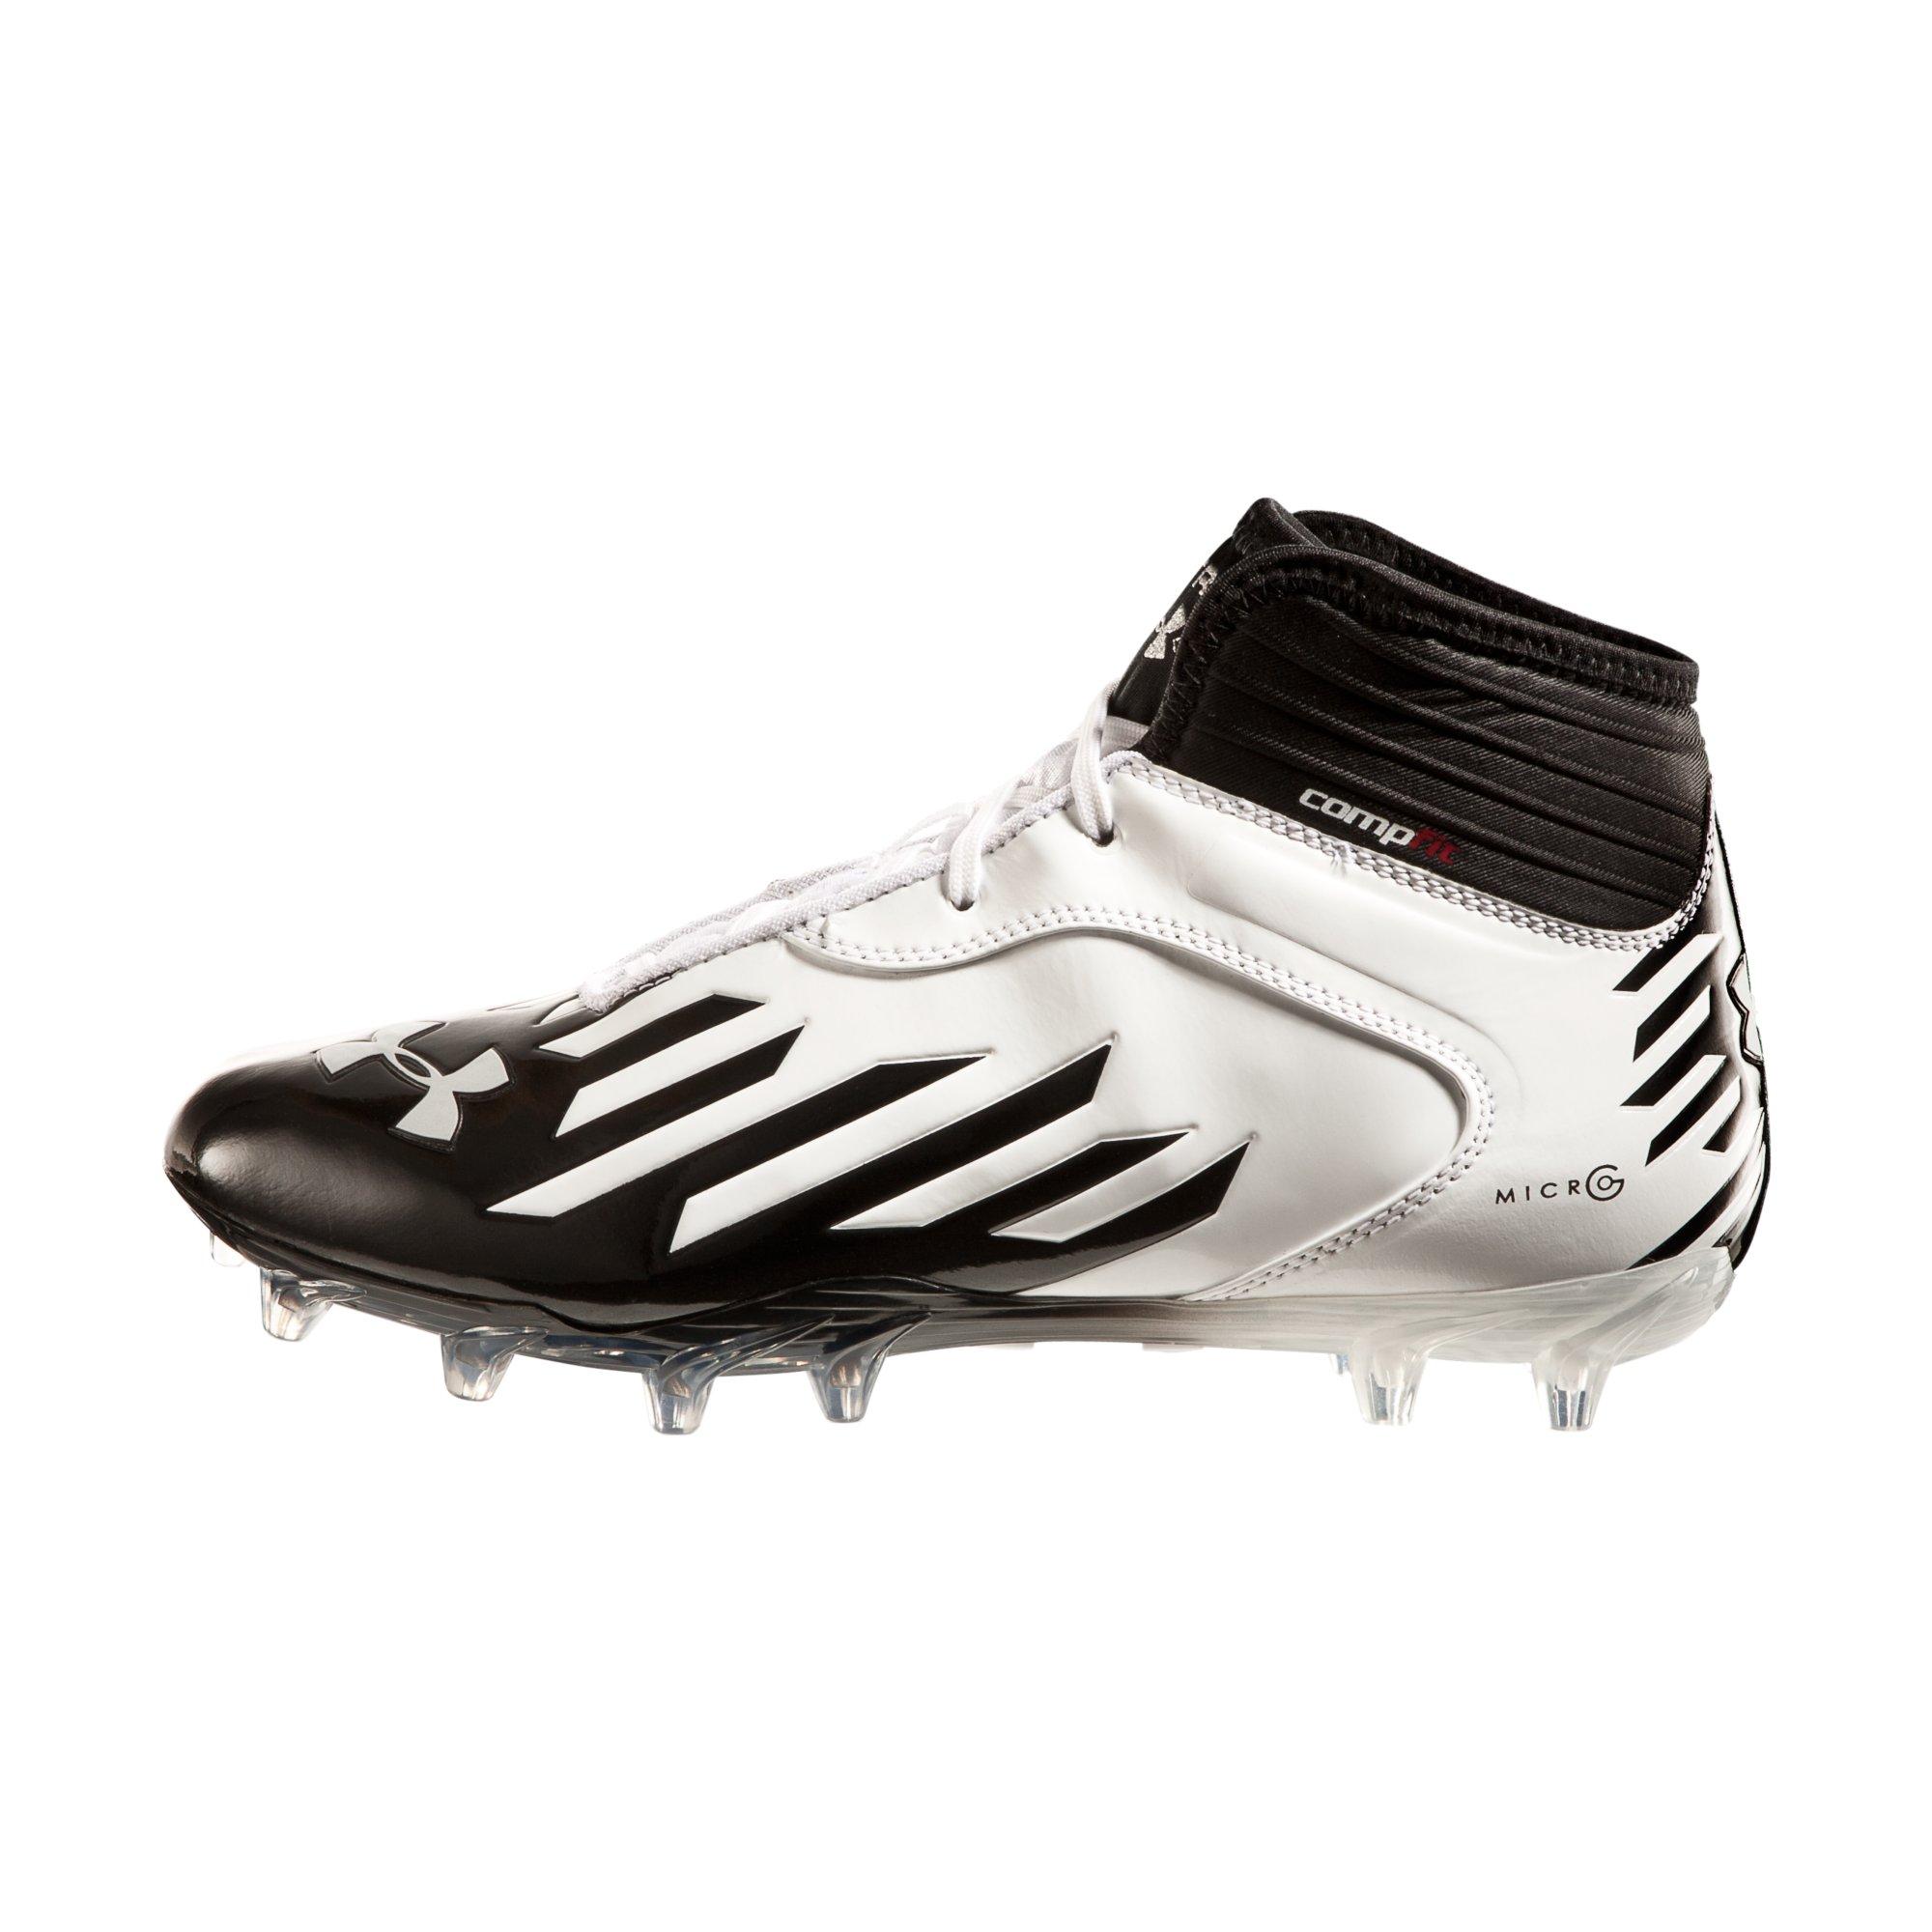 834892e33611 ray Asks About Men's UA Nitro Diablo MC CompFit® Mid Football Cleats -  Needle